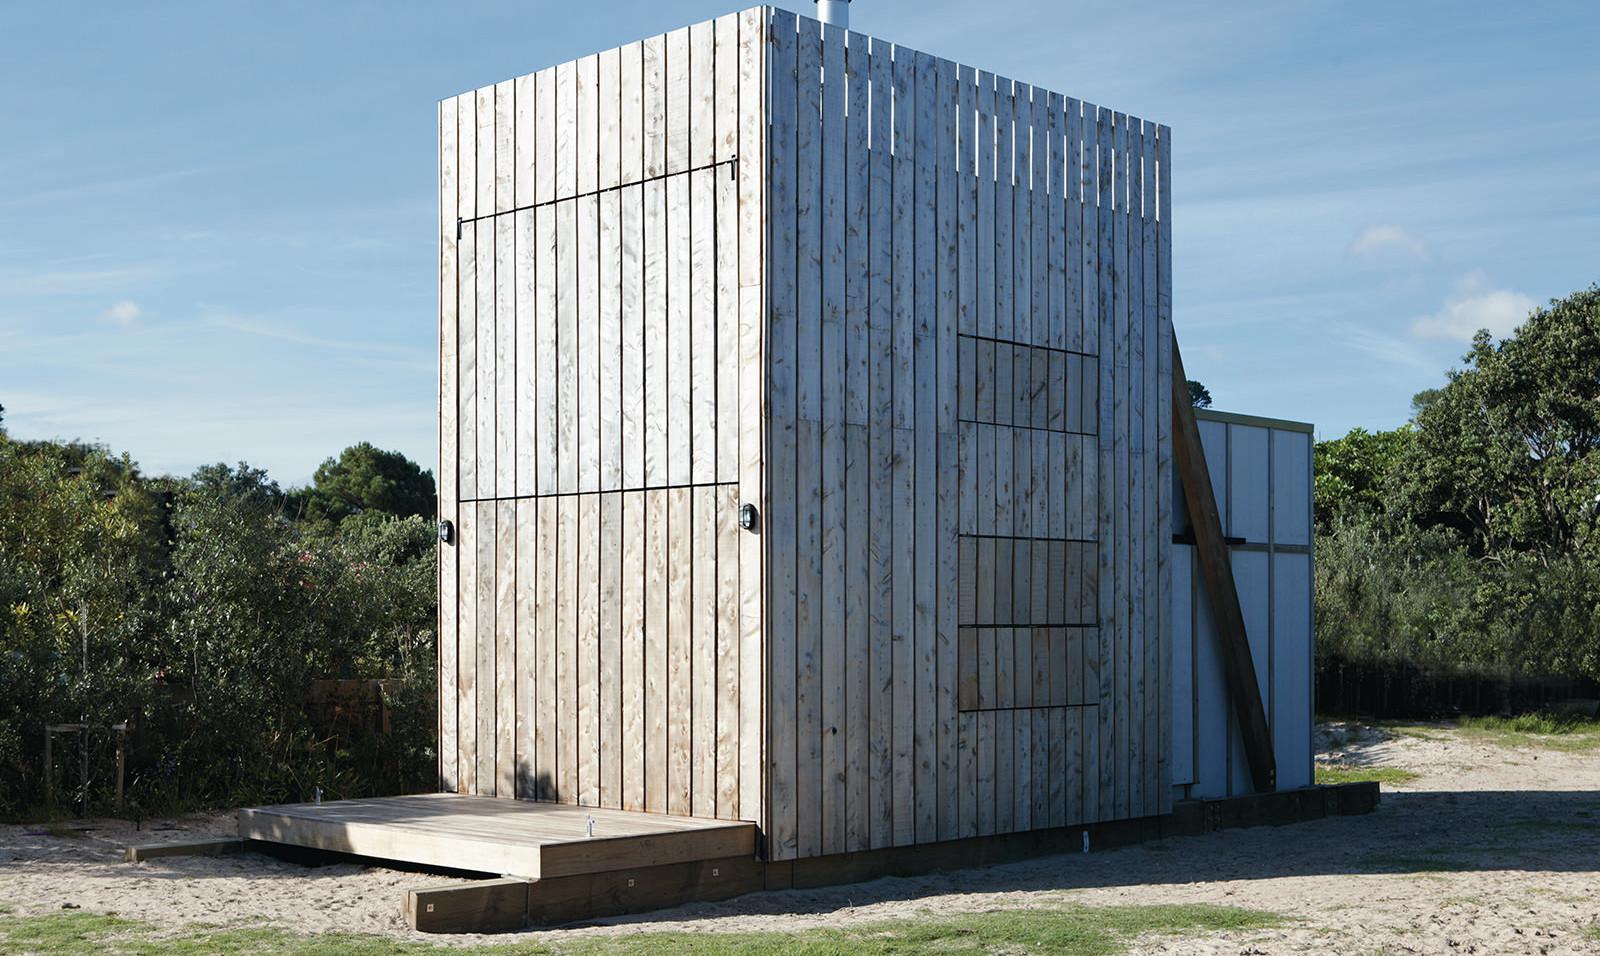 hut-on-sleds-crosson-architects-2.jpg